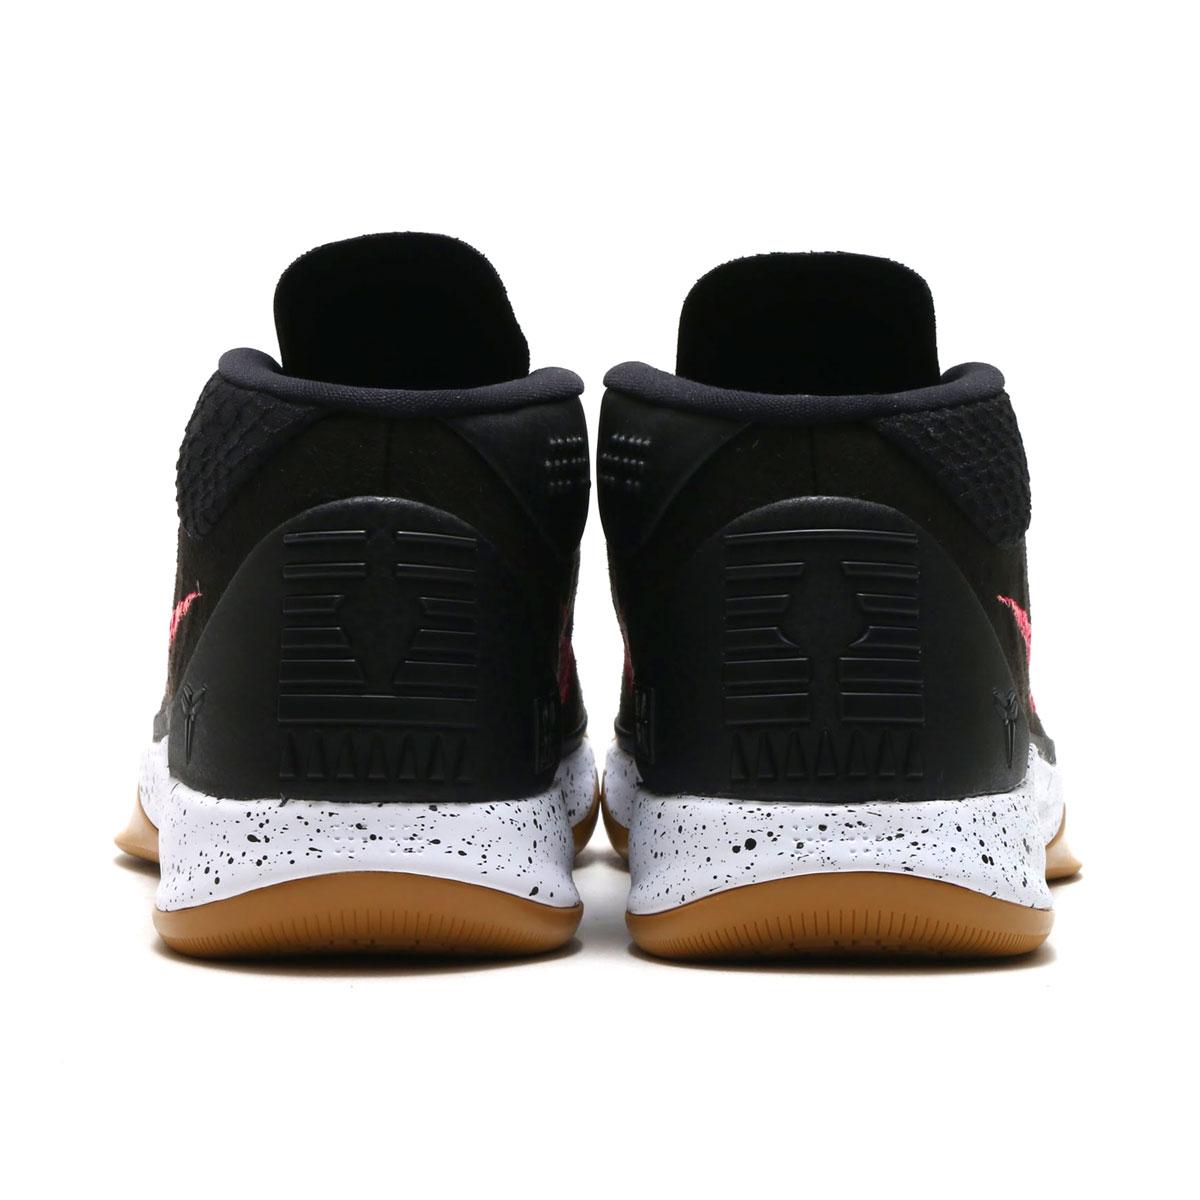 b0cb3fcbc6e5 NIKE KOBE A.D. EP (Nike Corby AD EP) (BLACK SAIL-GUM LIGHT BROWN) 17HO-S